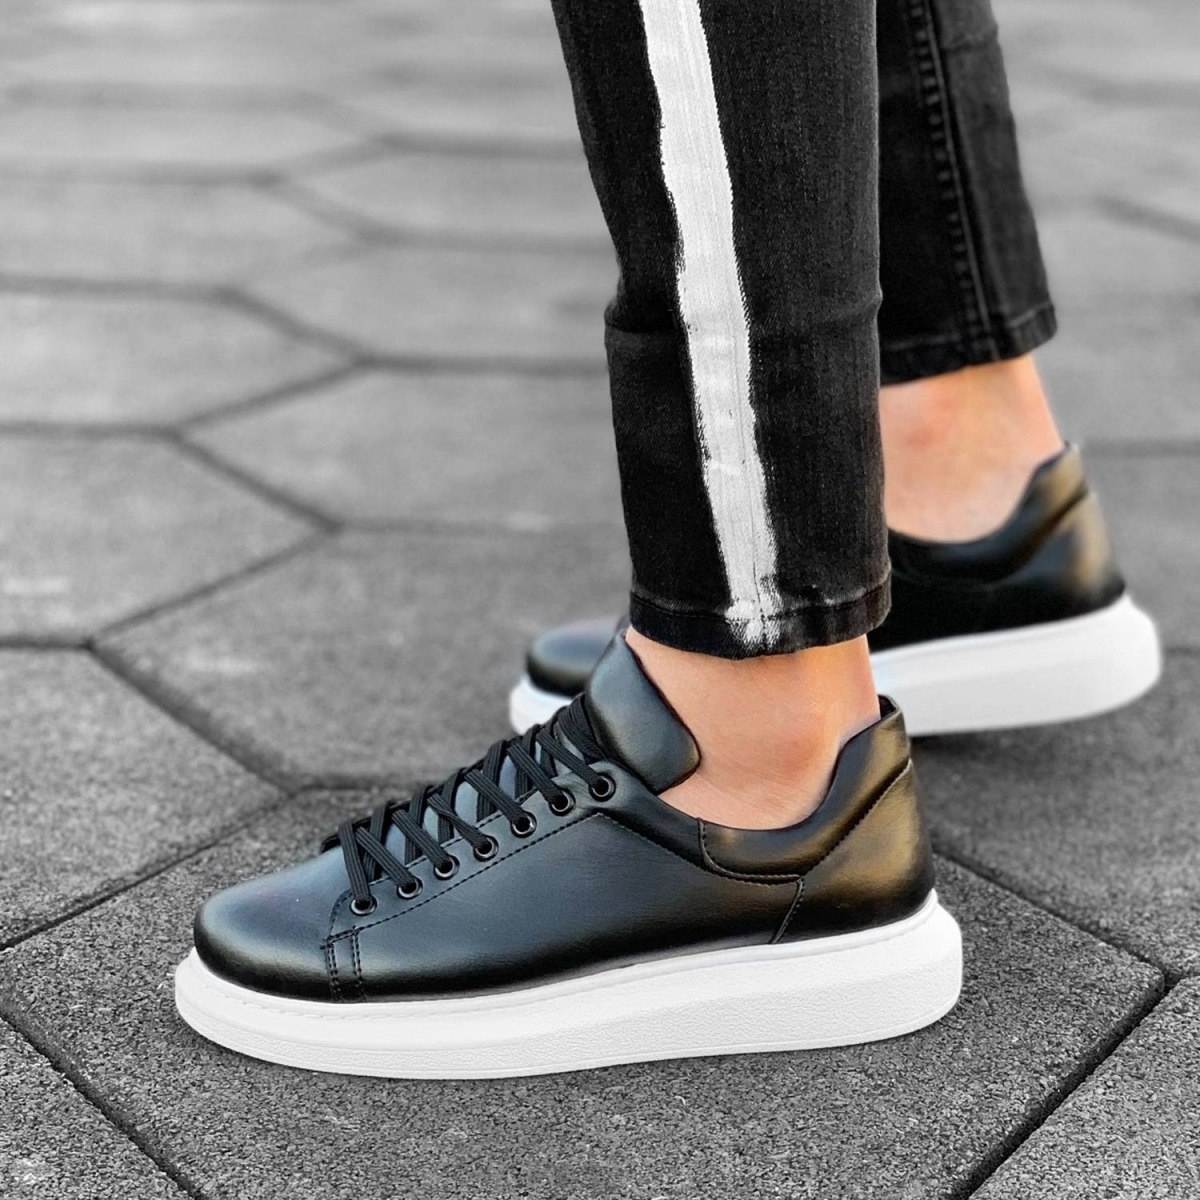 MV Mega Sole in Matte Black&White Sneaker MV Sneaker Collection - 3